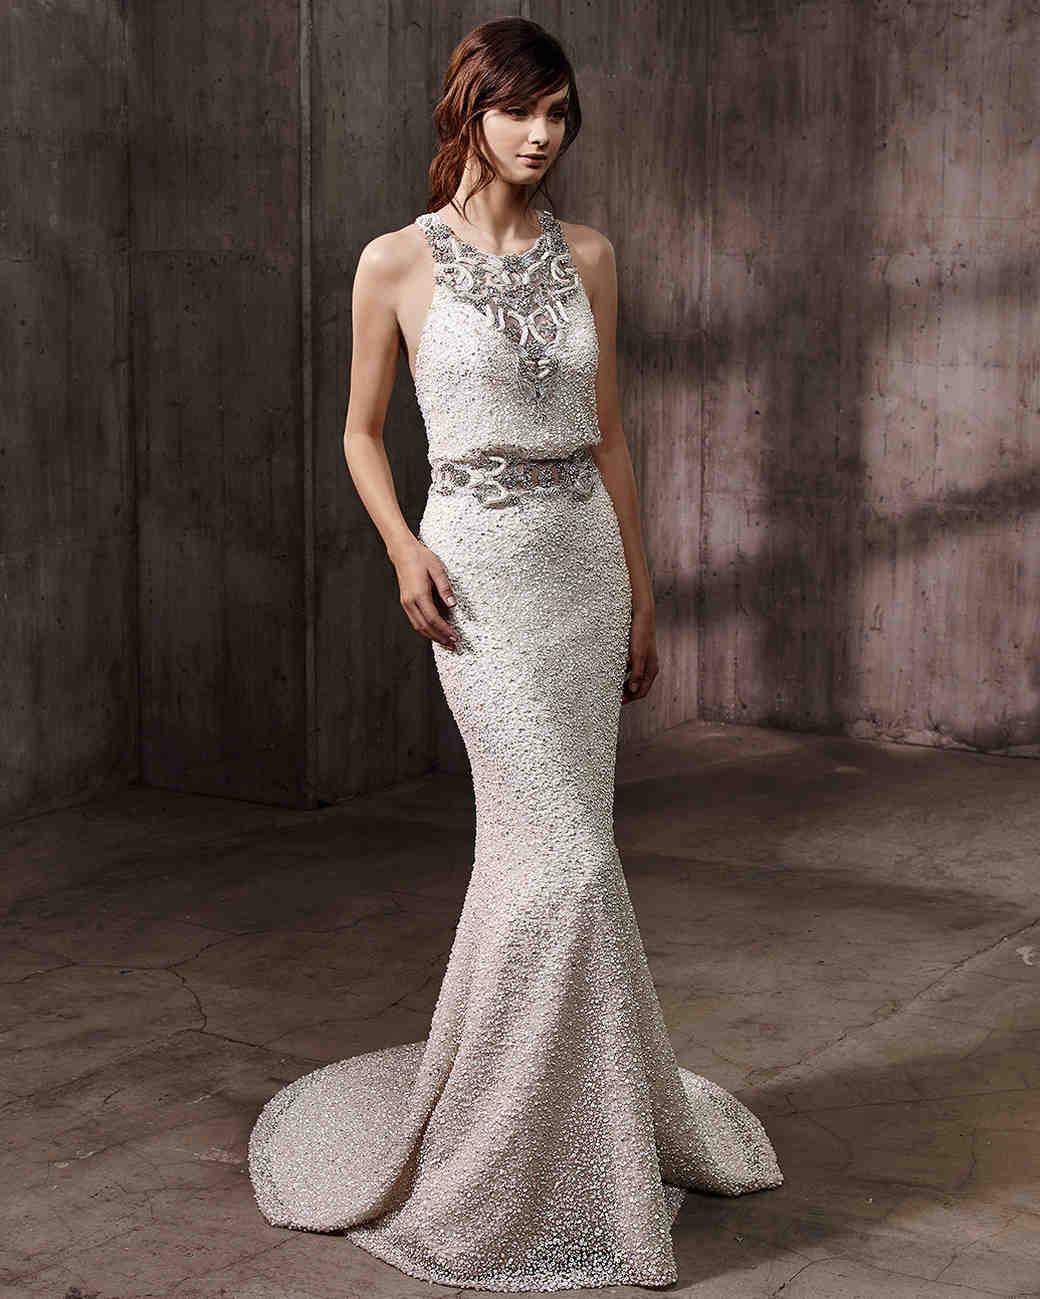 Badgley Mischka Fall 2017 Wedding Dress Collection  Martha Stewart Weddings